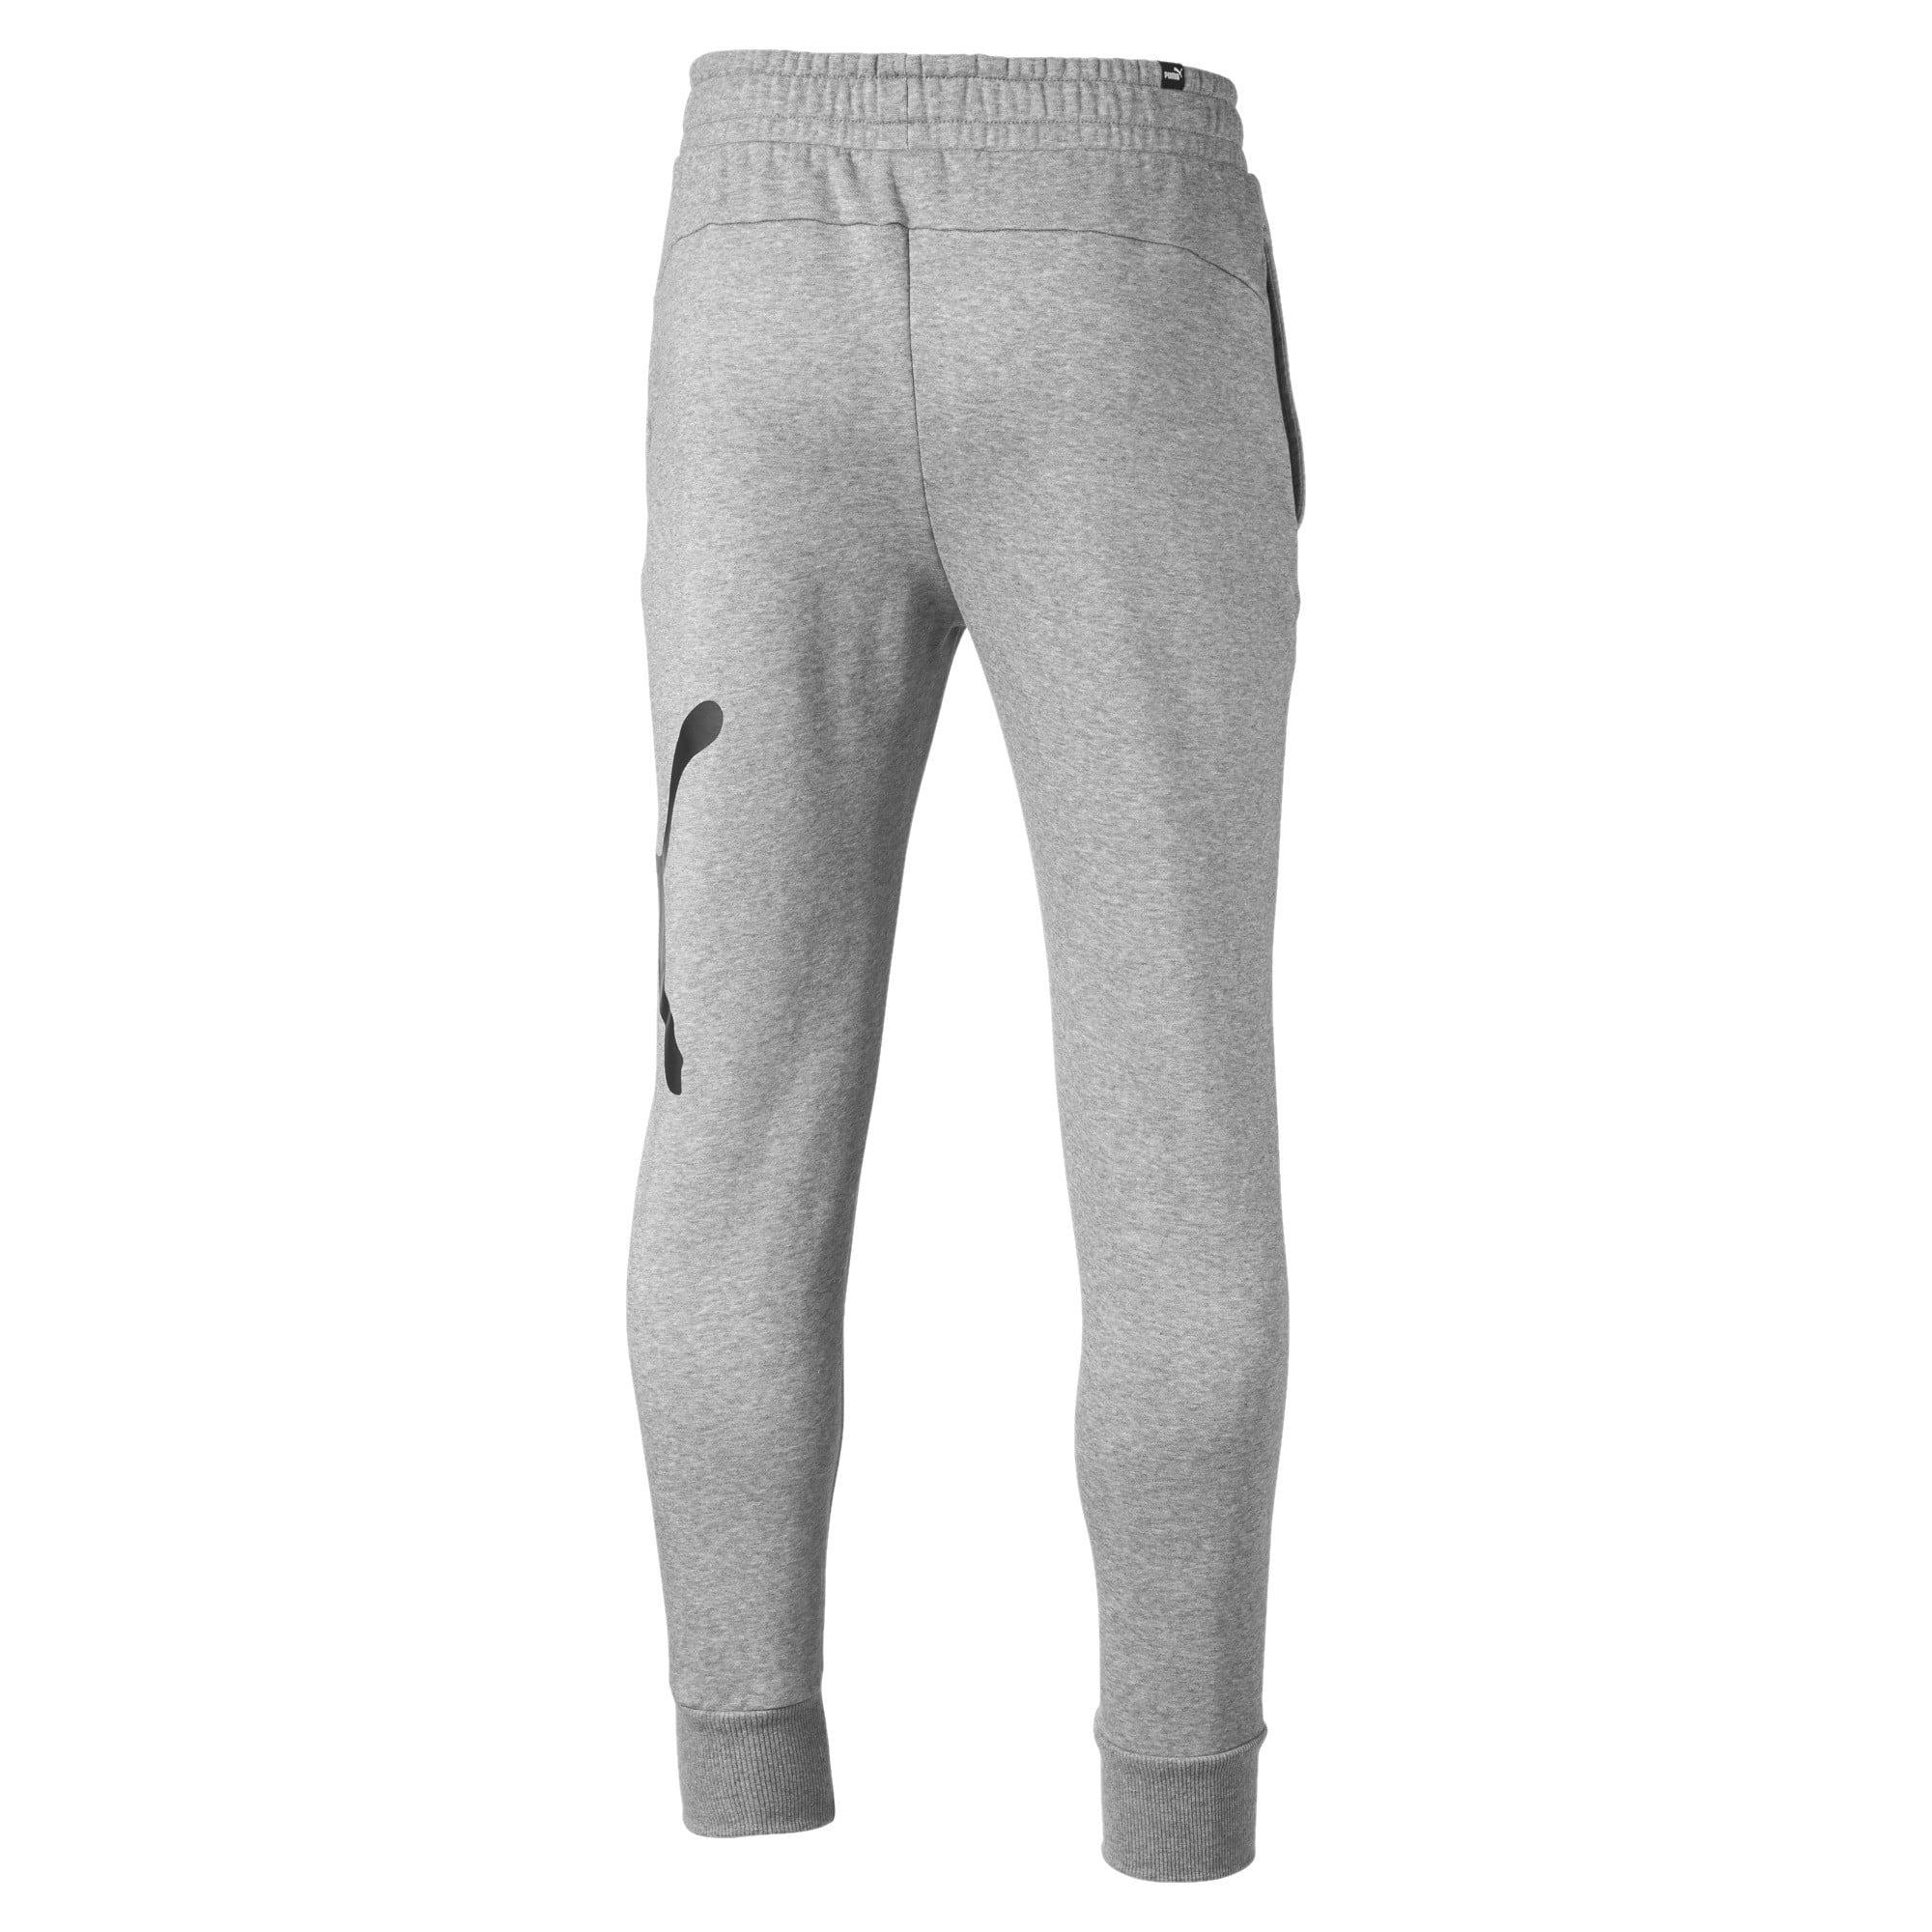 Thumbnail 5 of Men's Big Logo Fleece Sweatpants, Medium Gray Heather, medium